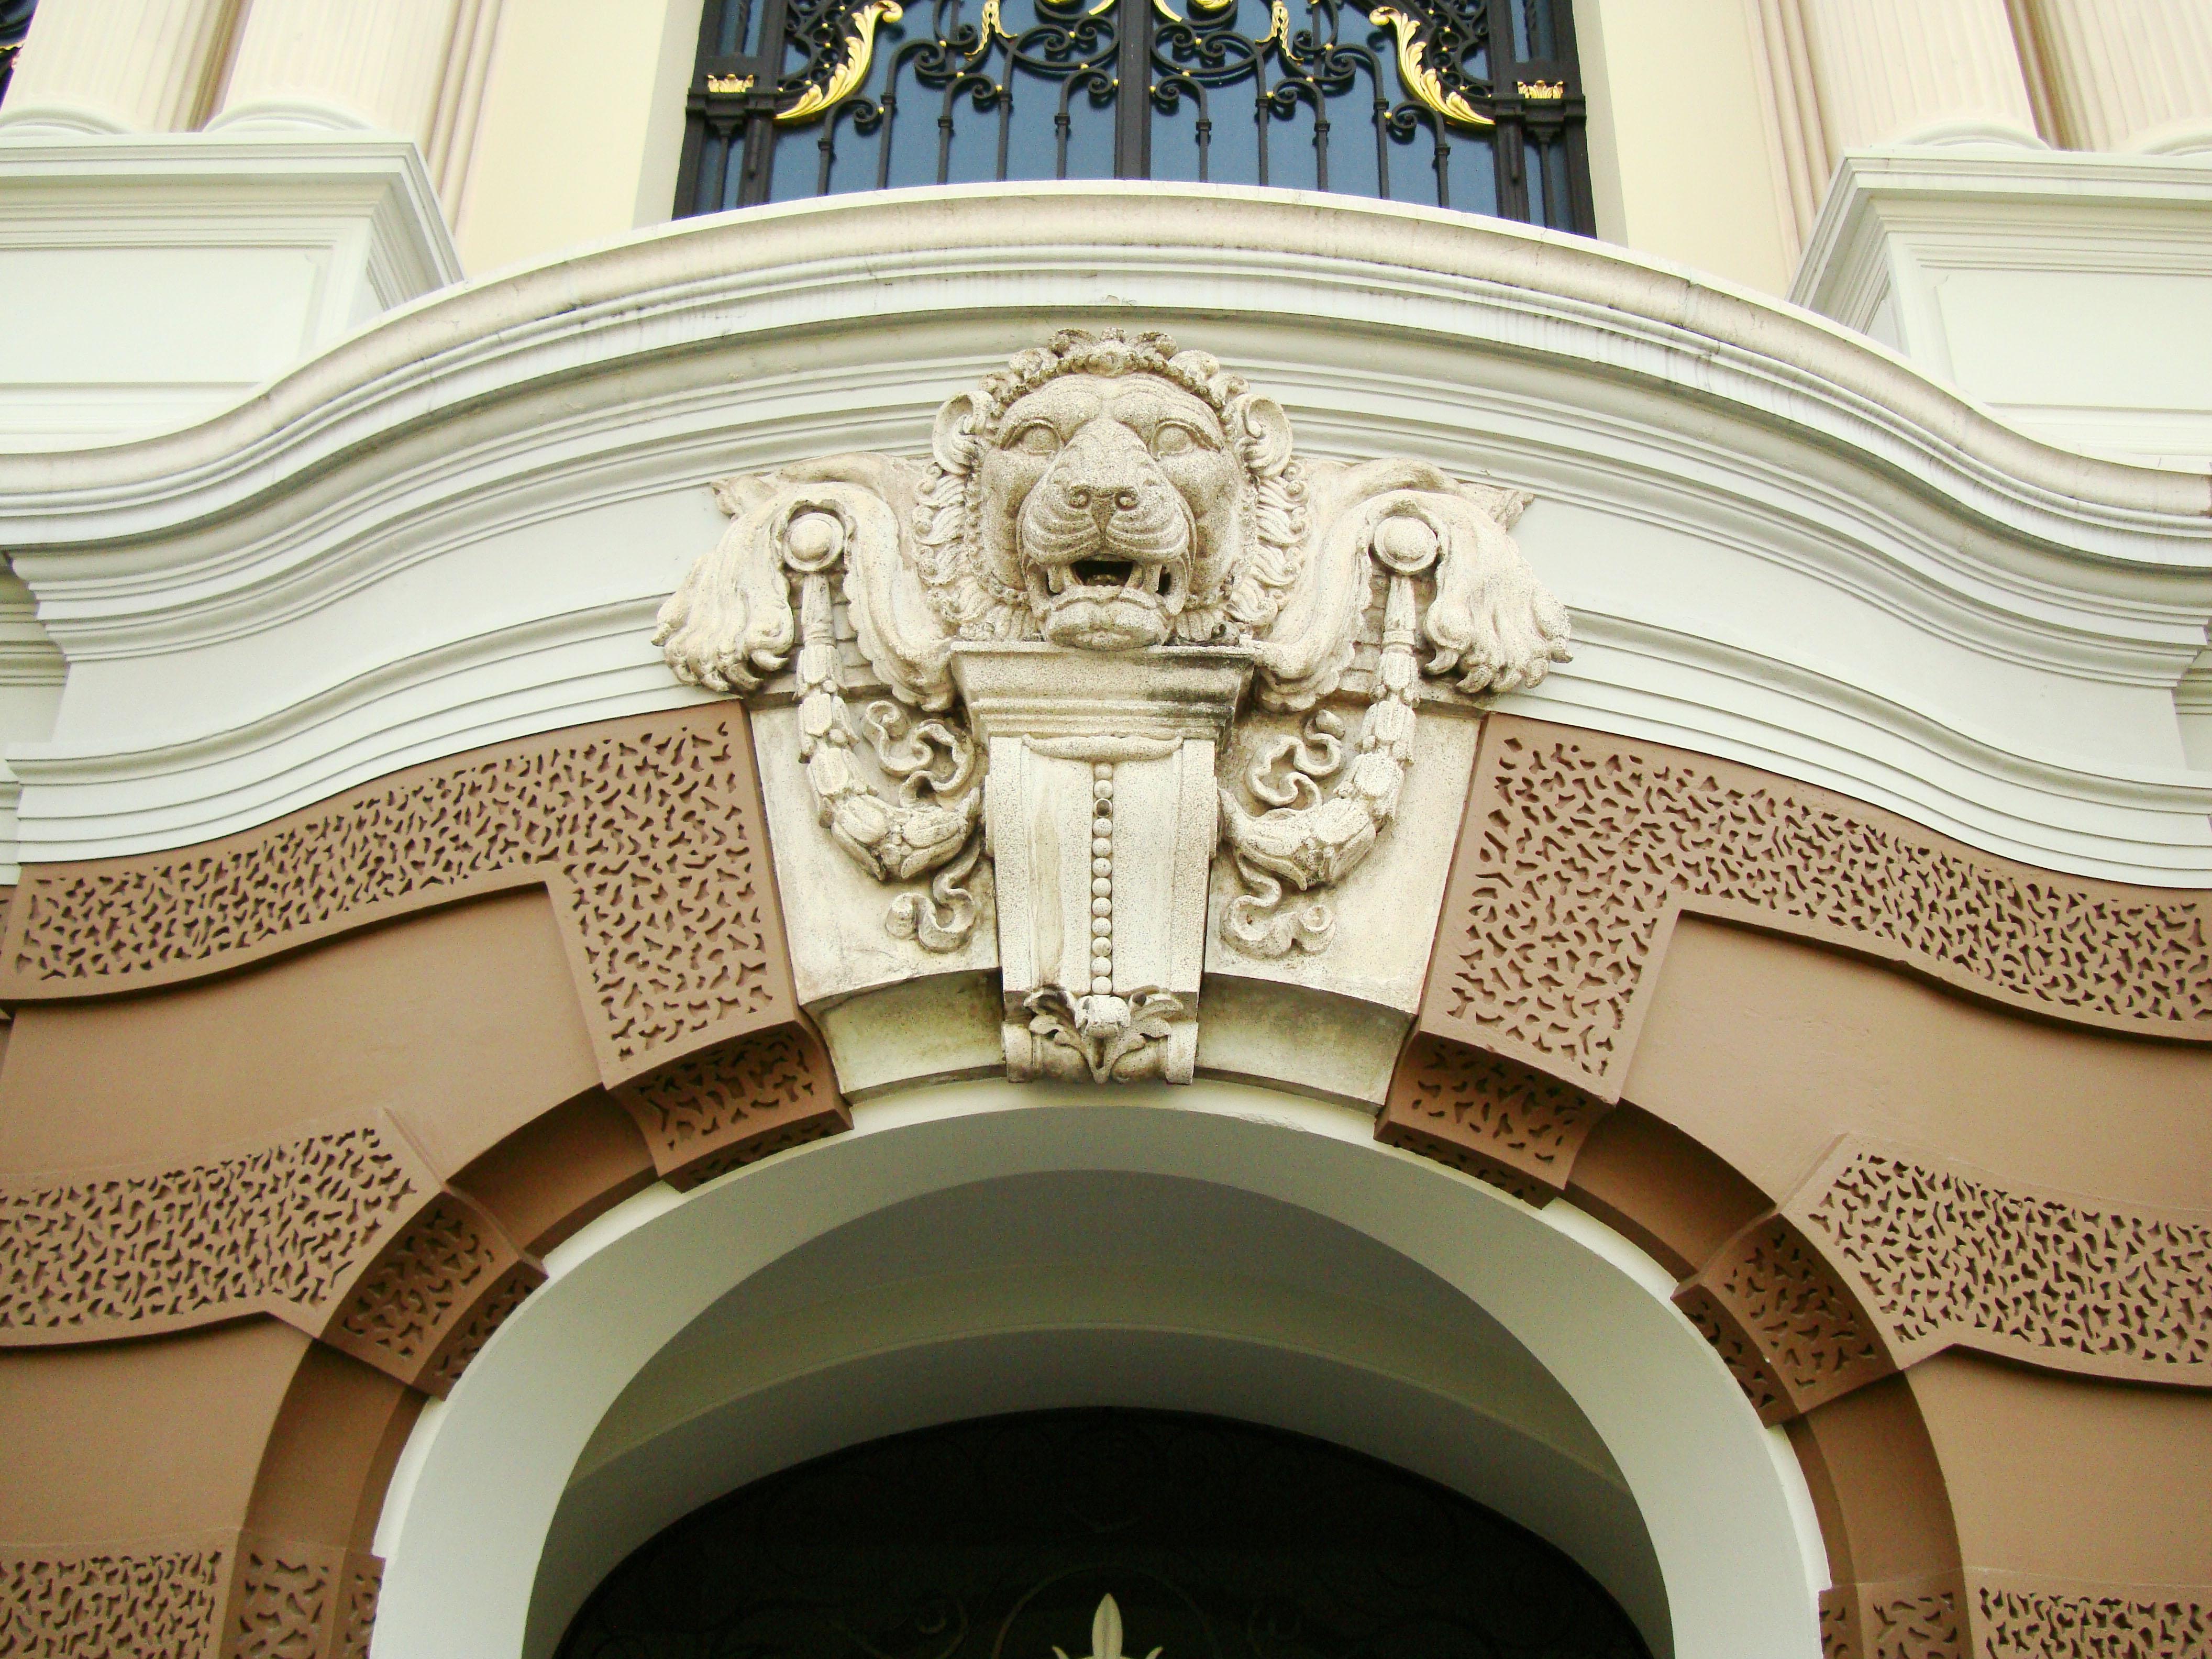 26 Chakri Maha Prasat Hall Grand Palace Bangkok Thailand 08